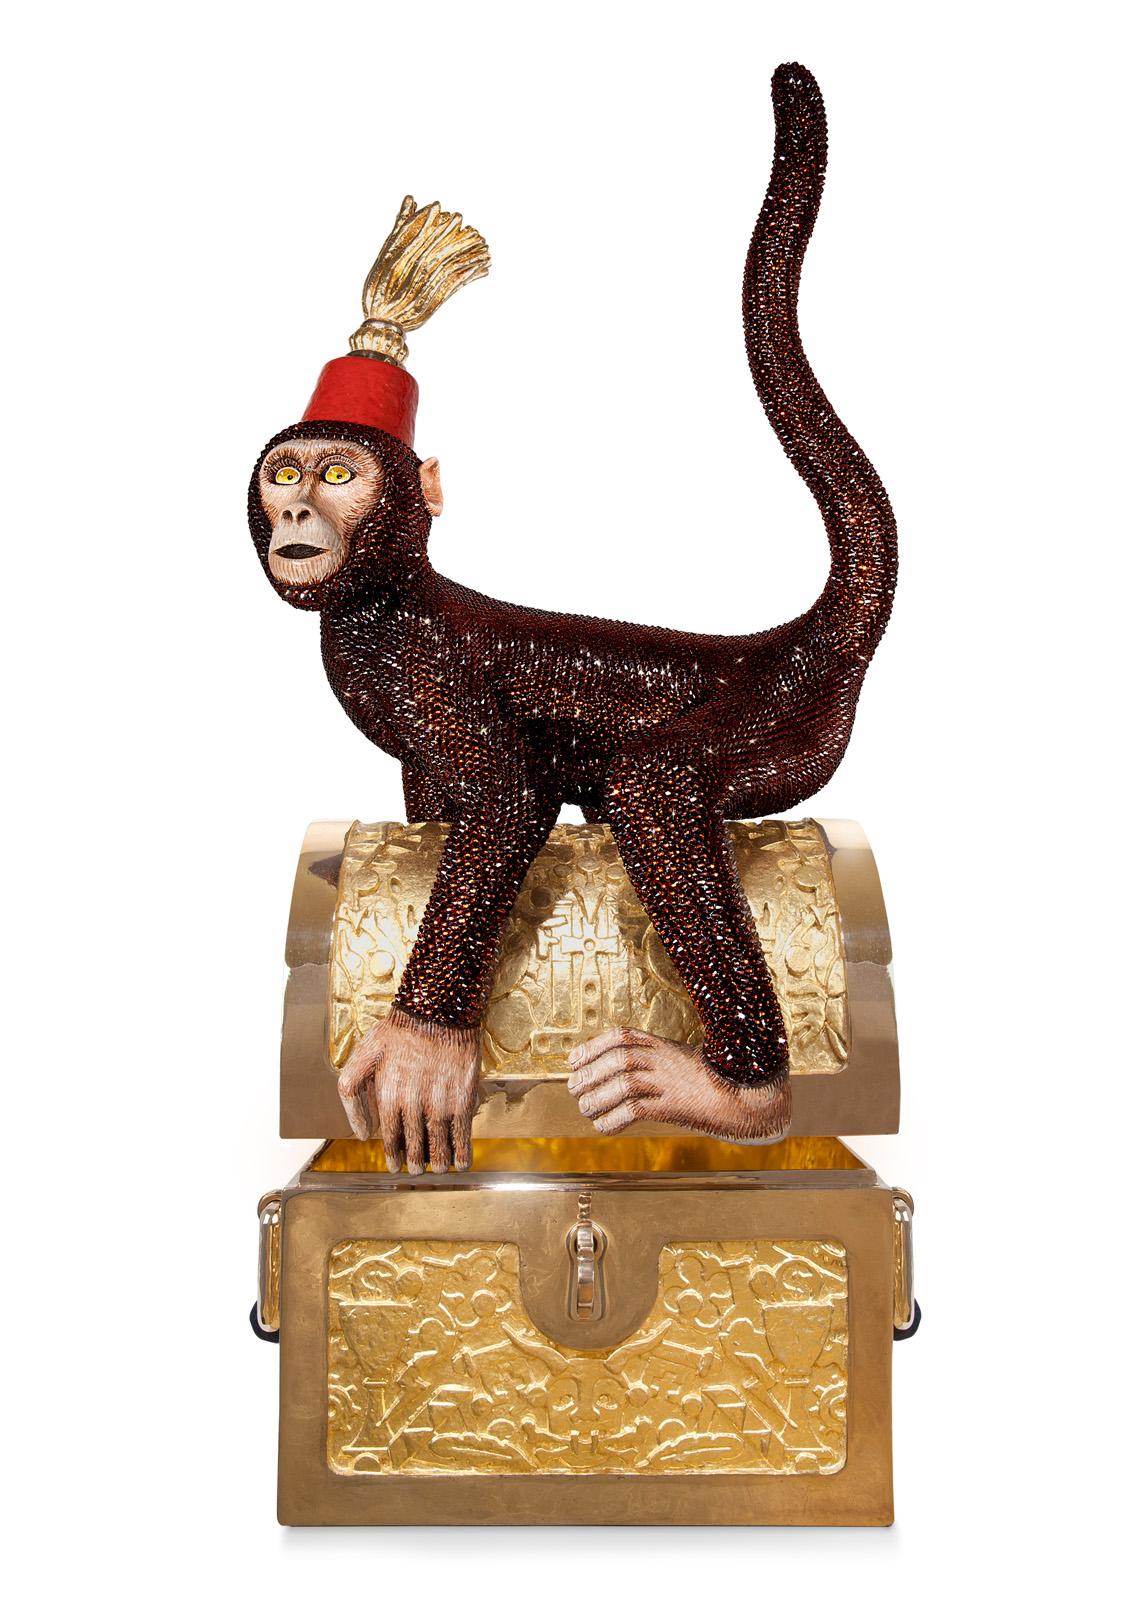 Monkey Business, 2013